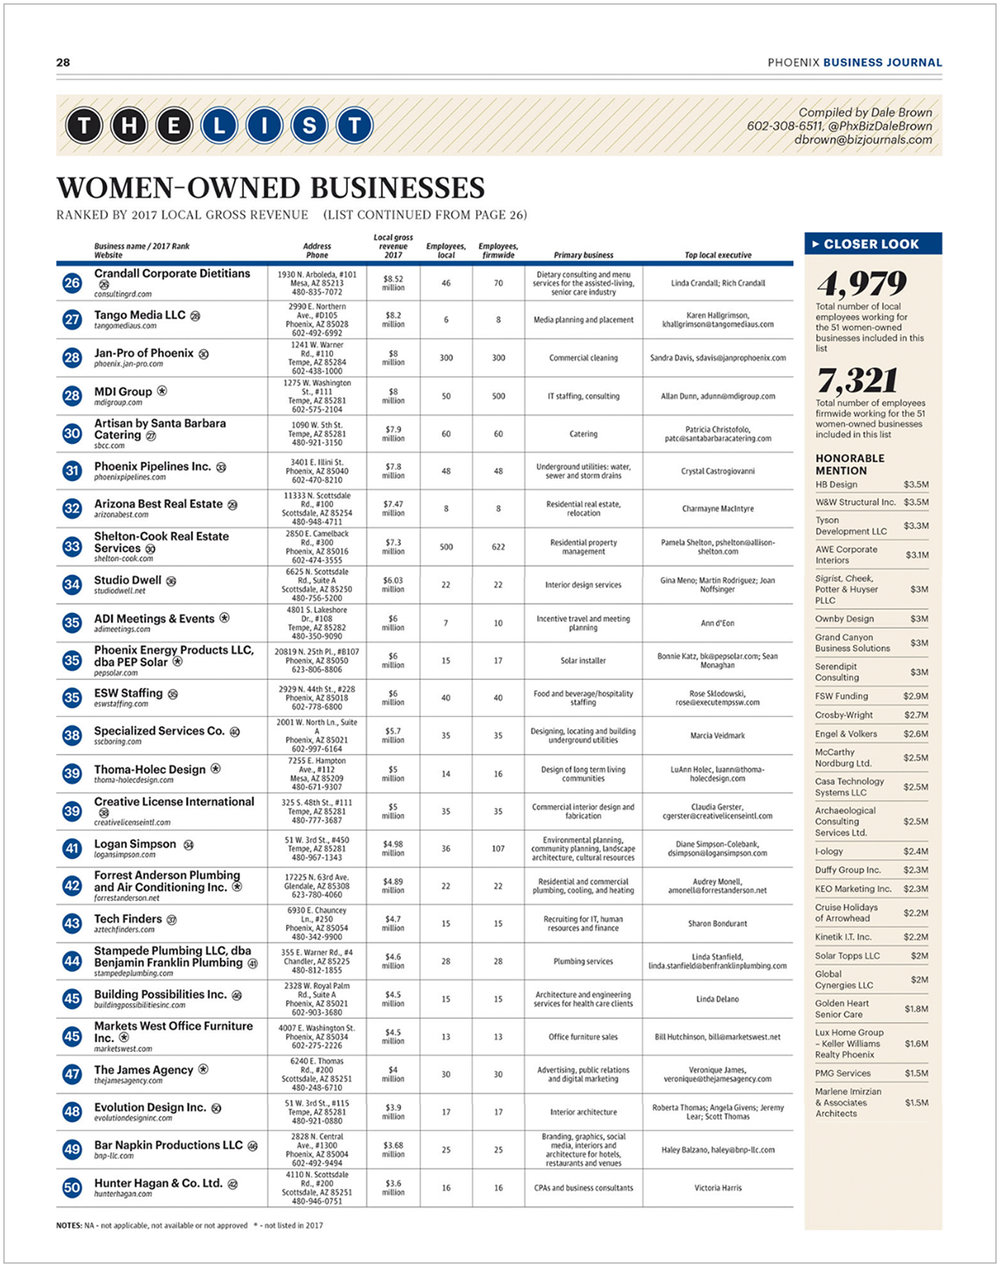 180416 Phoenix Business Journal Article.jpg